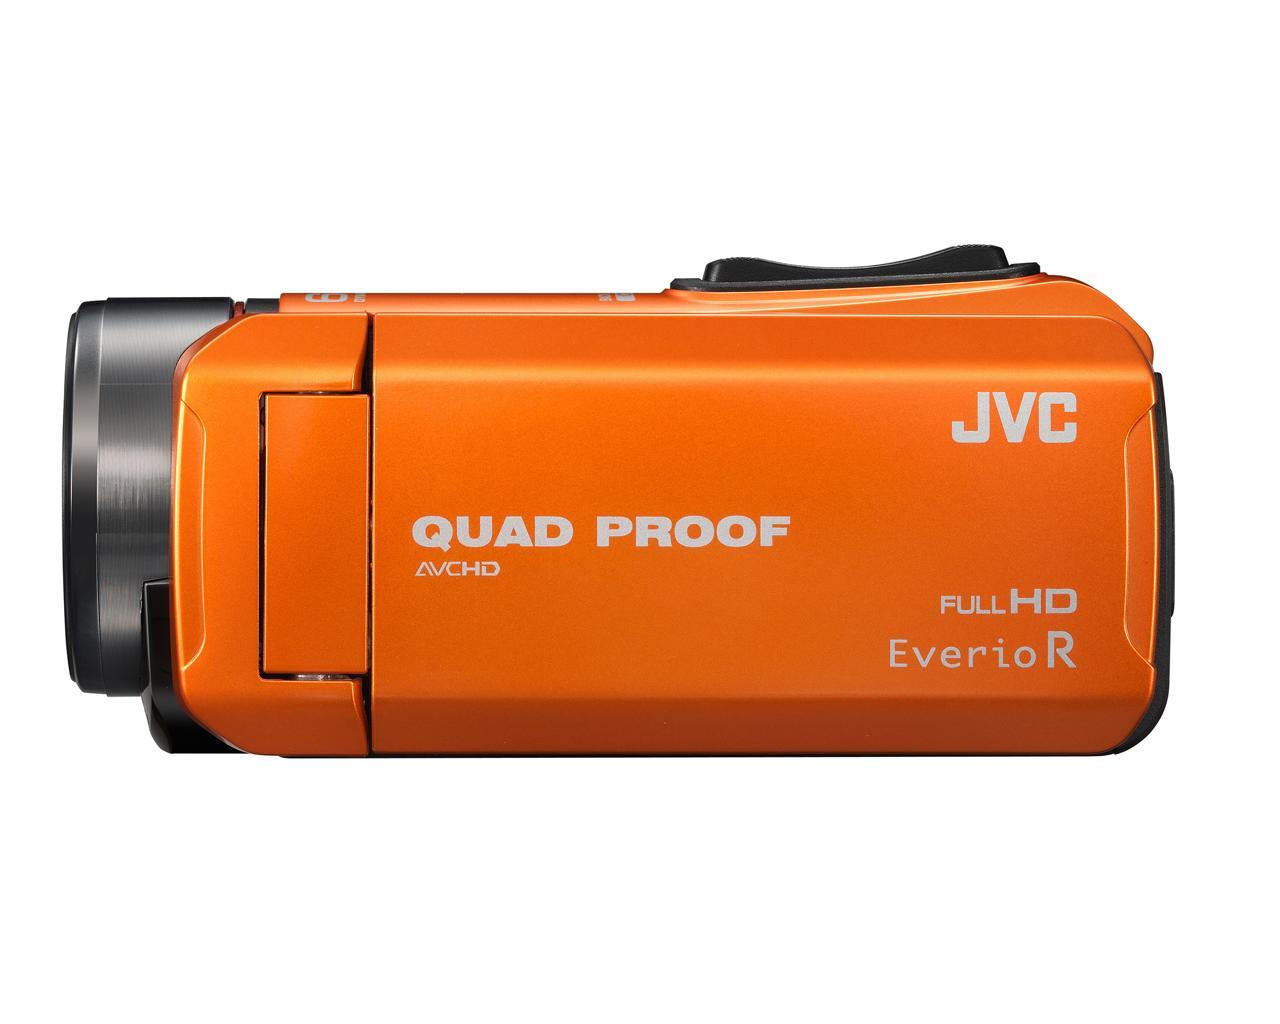 GZ-R435 2,5 MP CMOS Caméscope portatif Orange Full HD